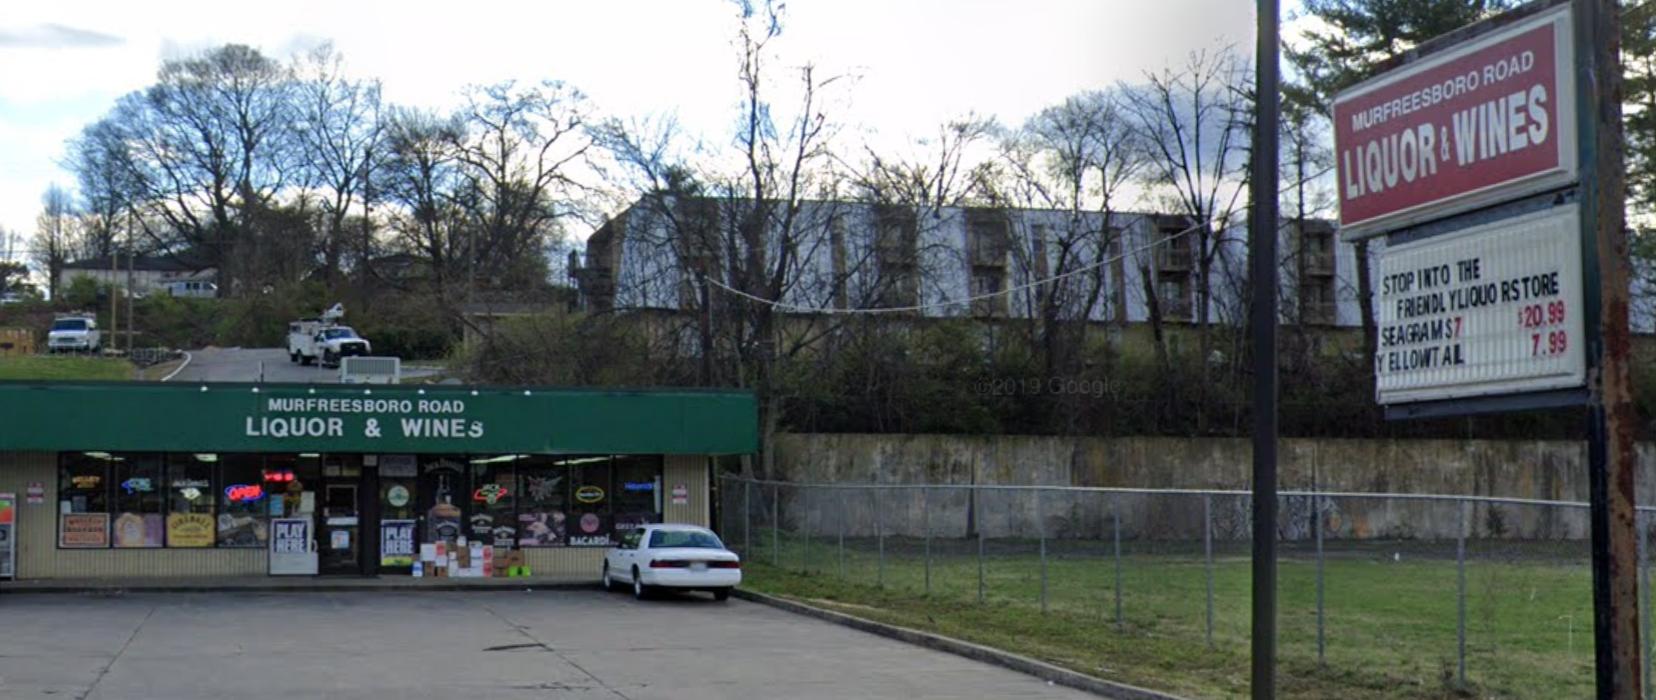 Murfreesboro Road Liquor and Wines